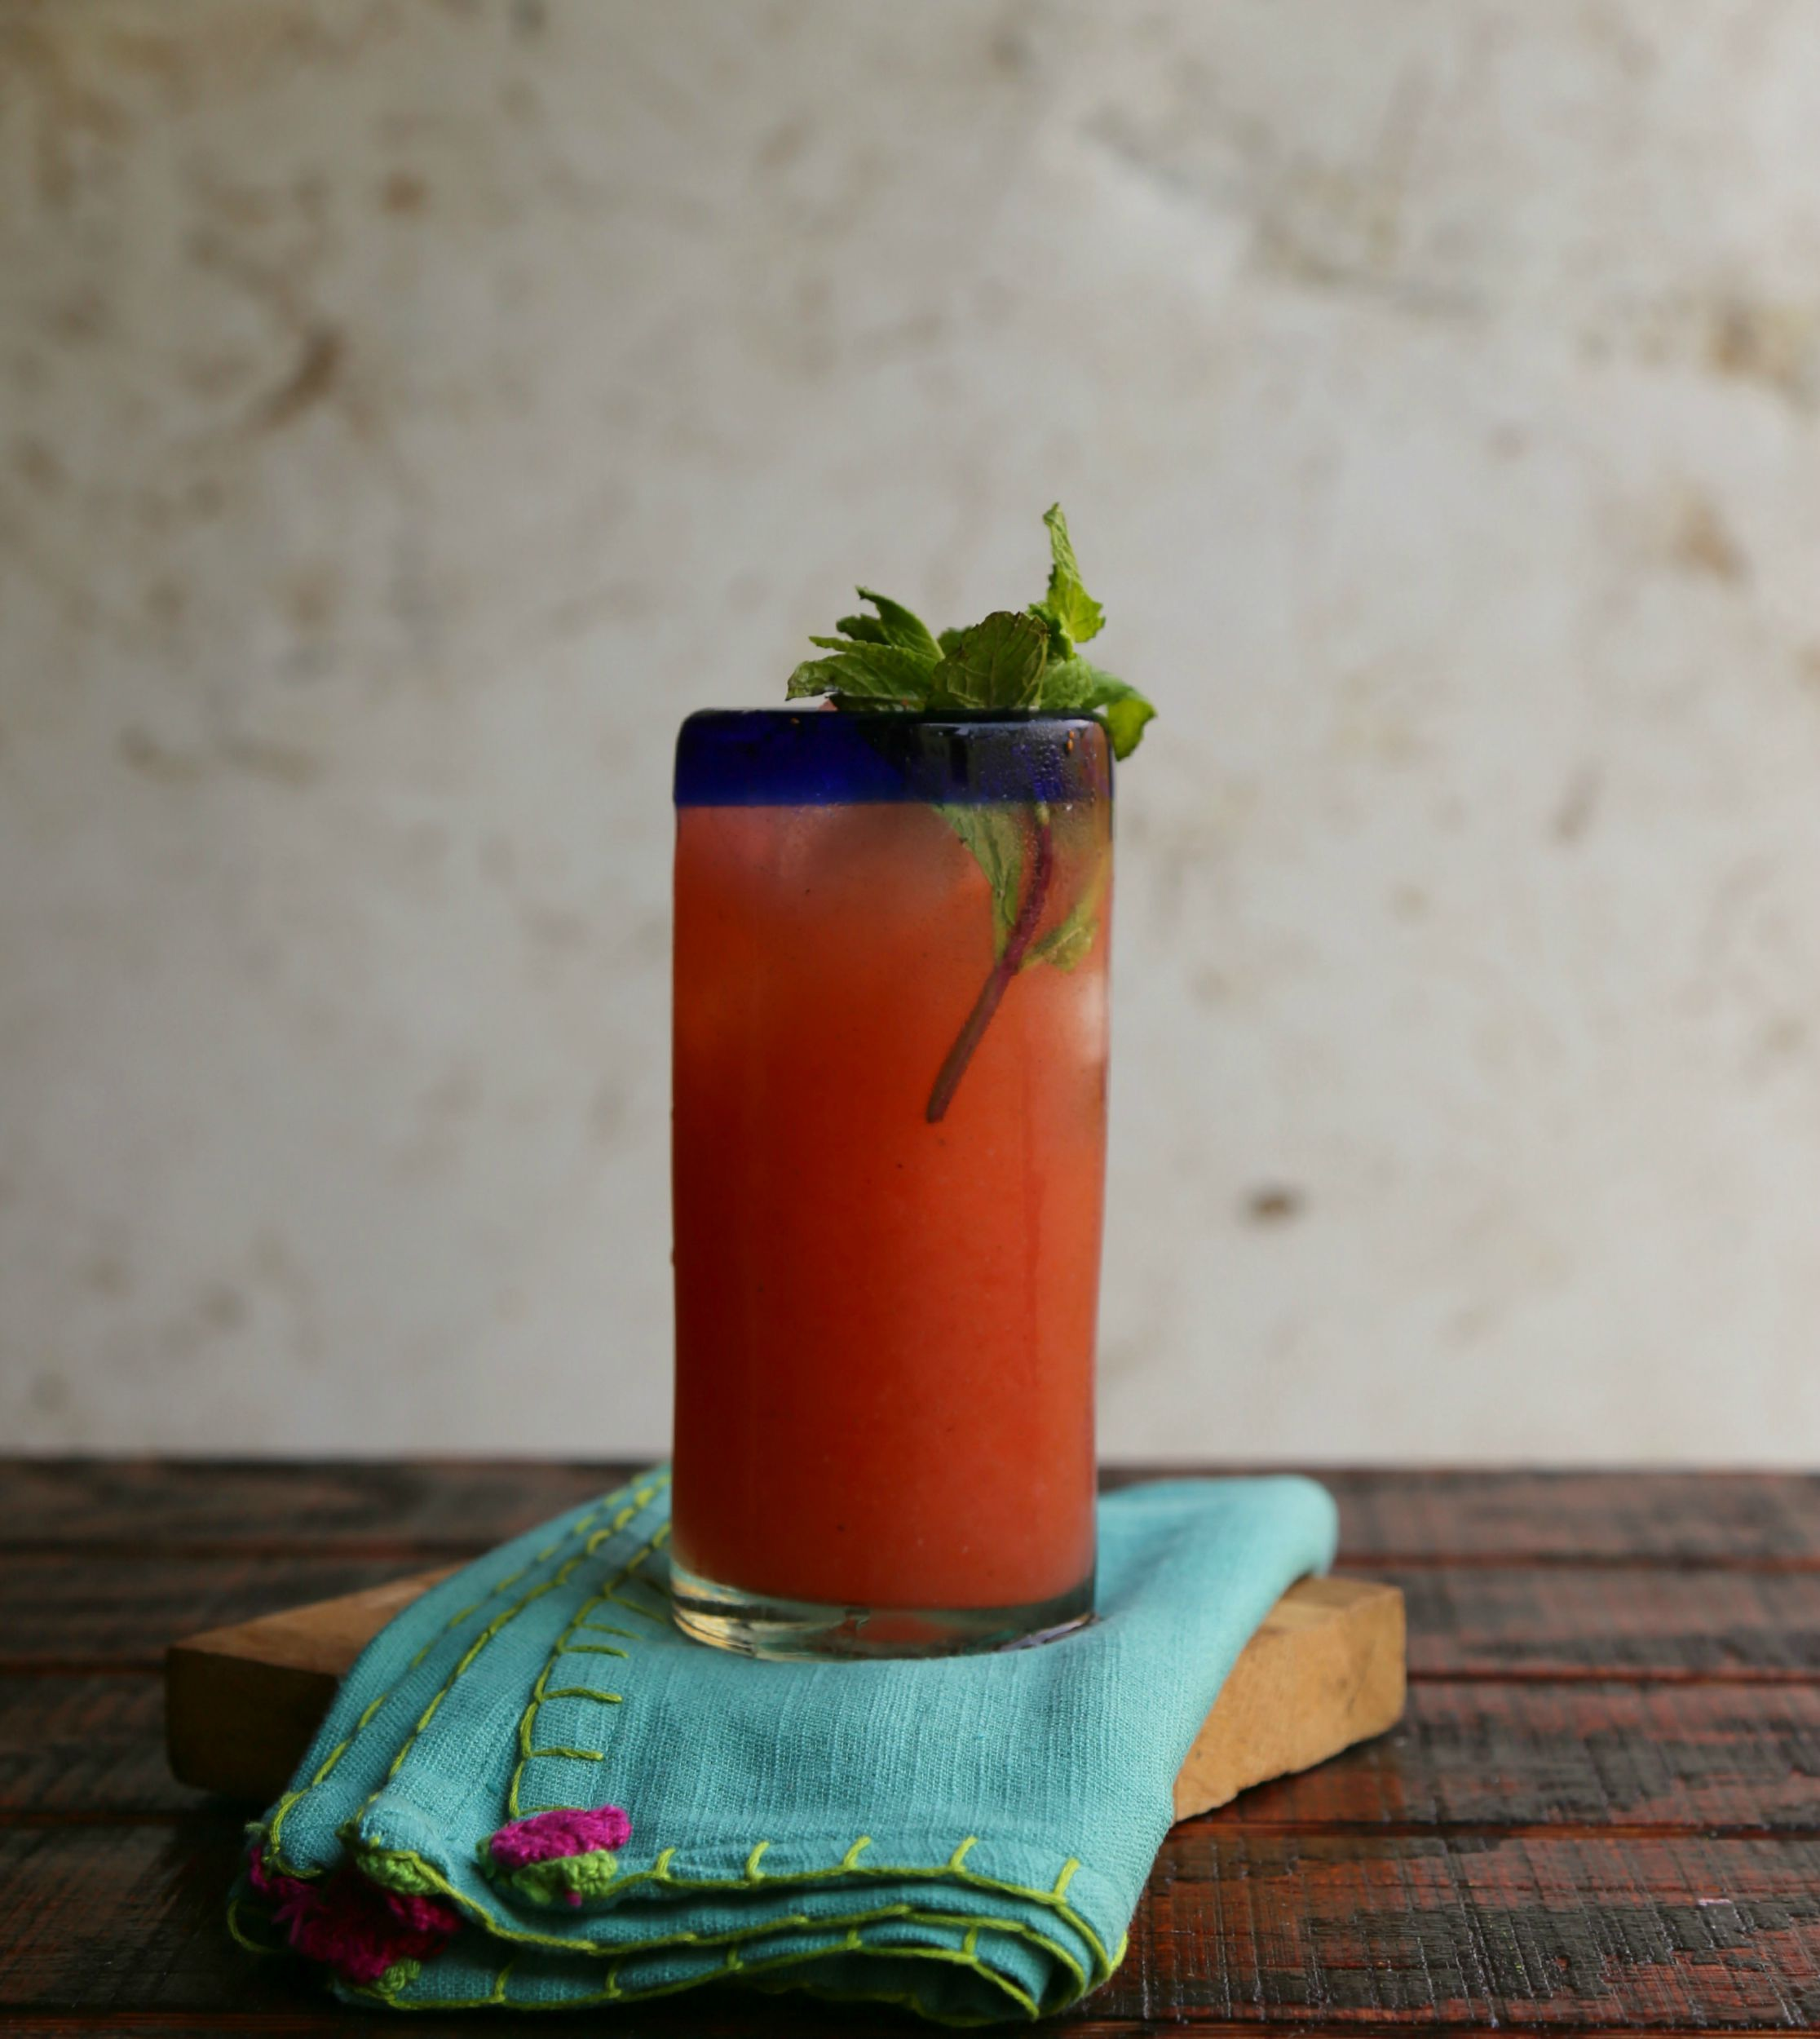 strawberry-agua-fresca-vianneyrodriguez-sweetlifebake